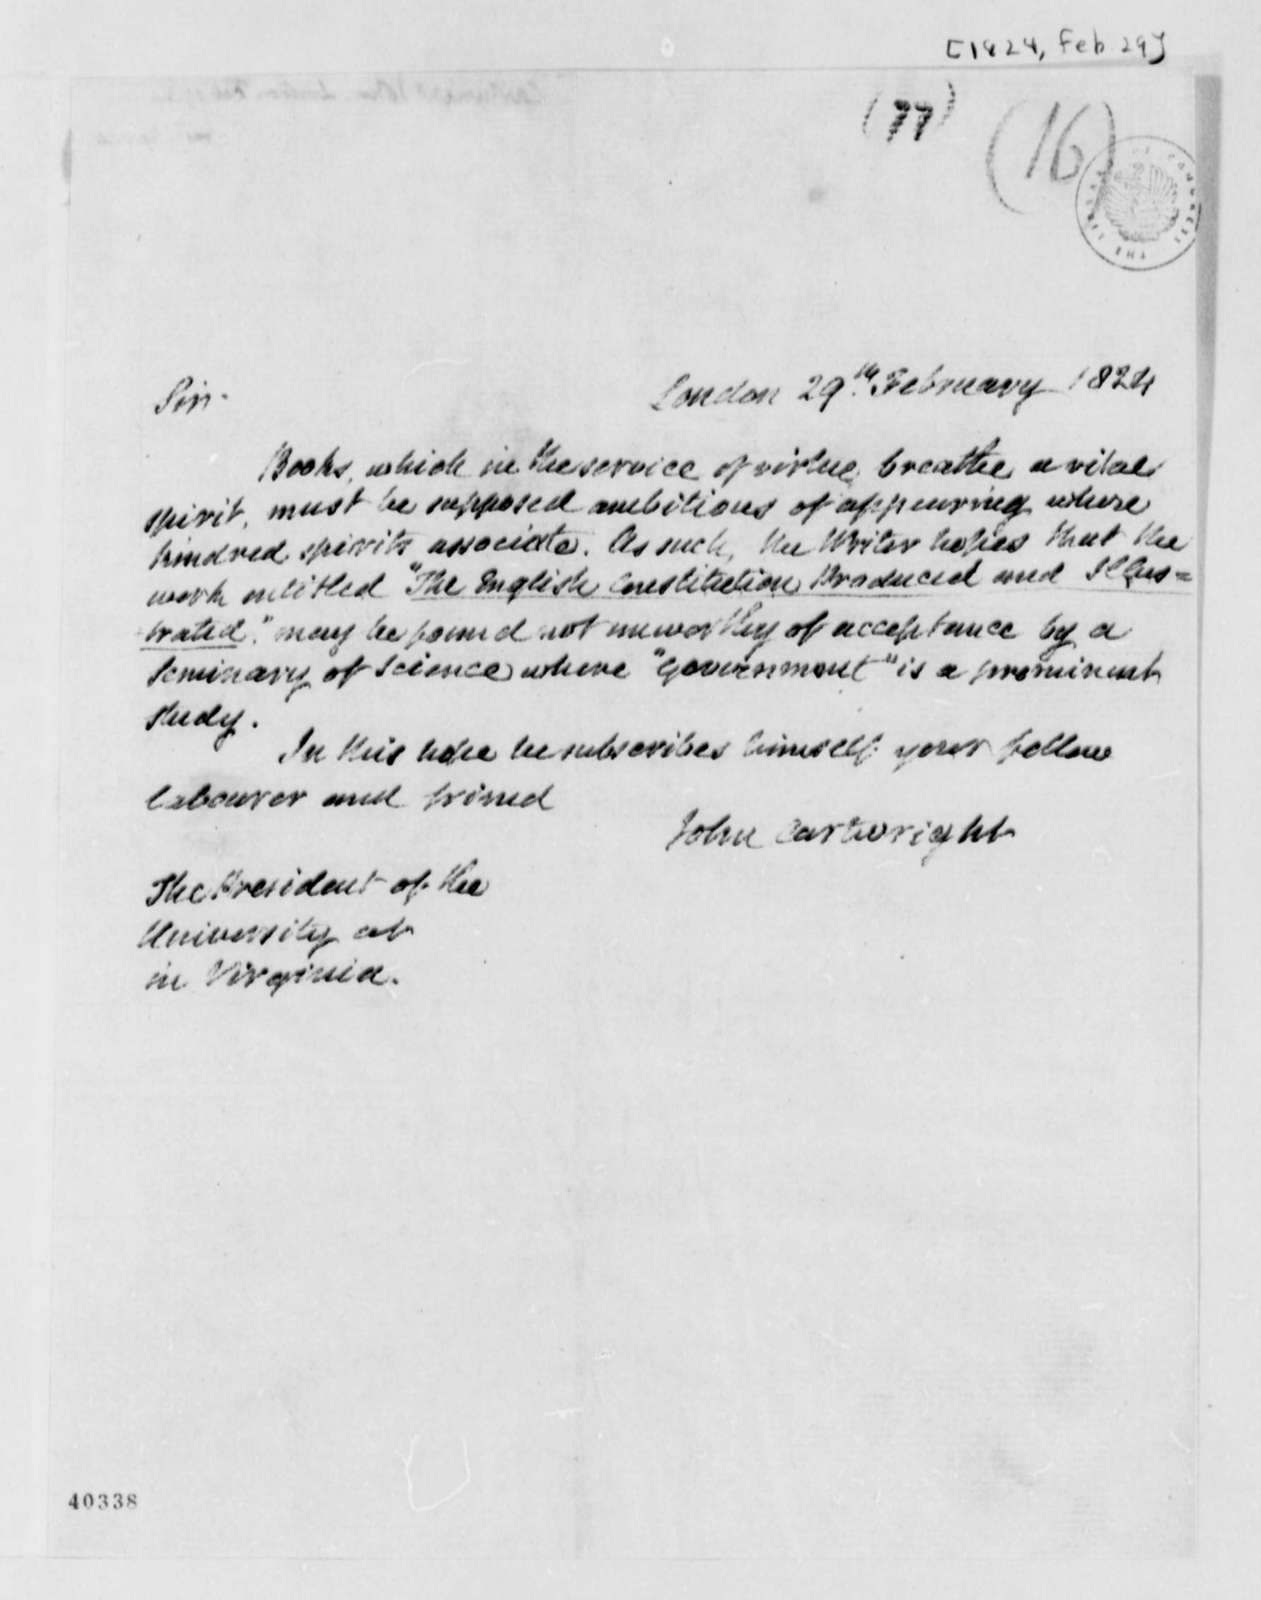 John Cartwright to John Cartwright, February 29, 1824